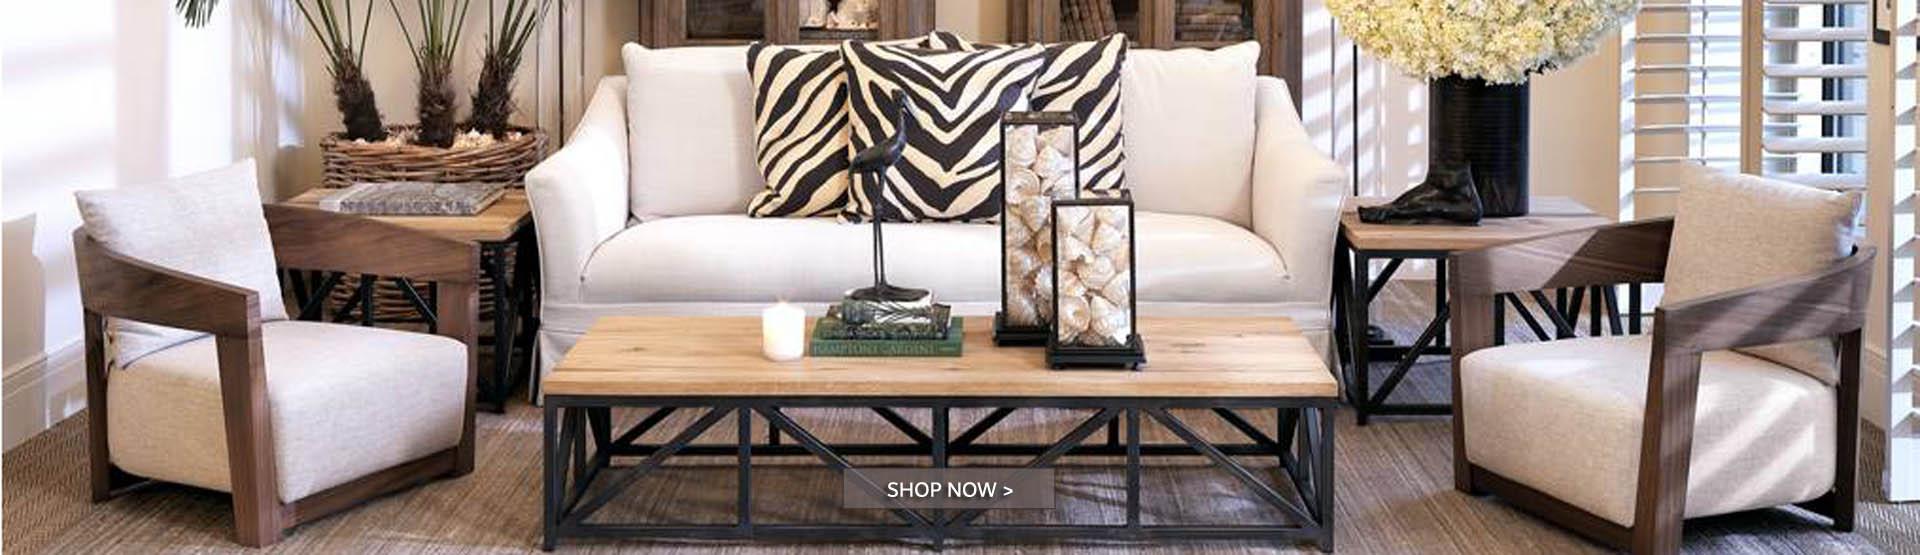 Luxury Fabric Sofas